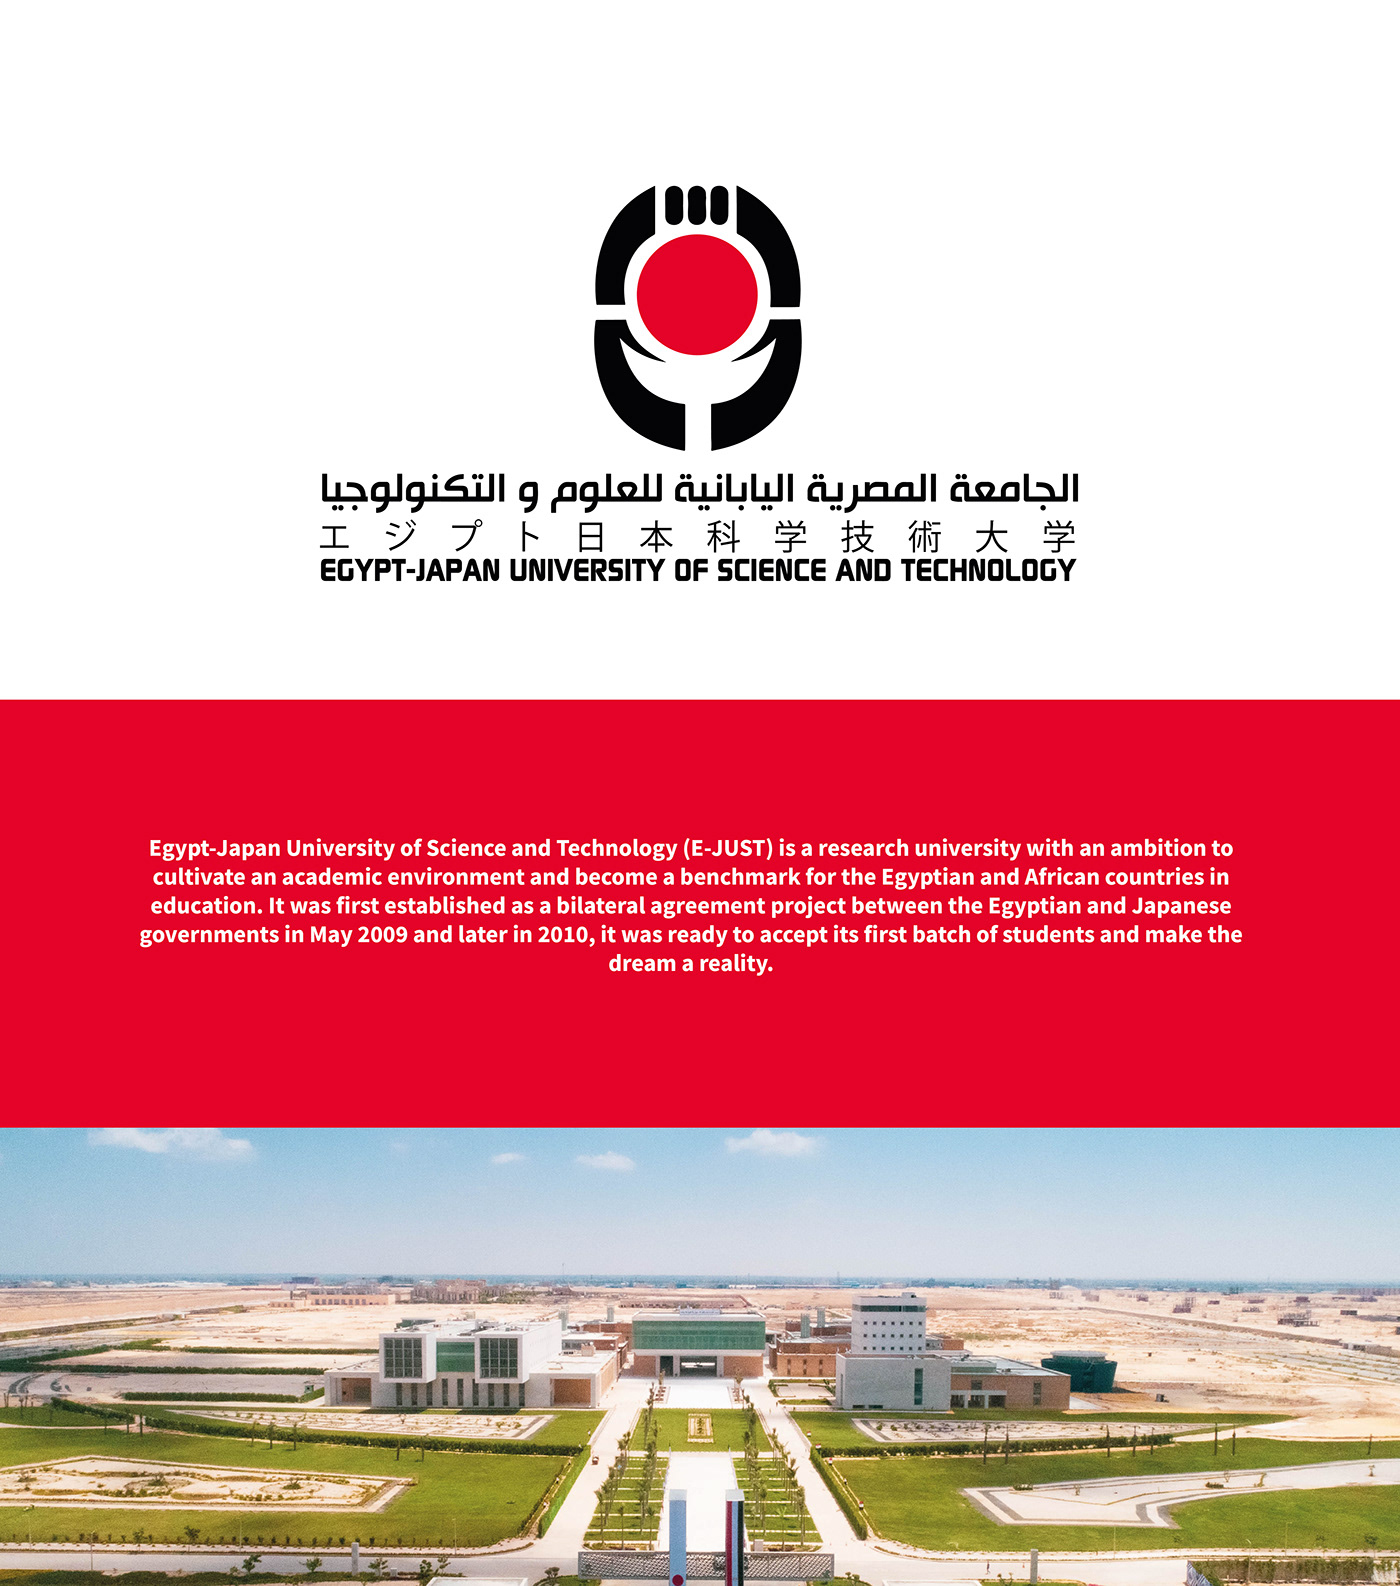 egypt japan rebranding science Technology University